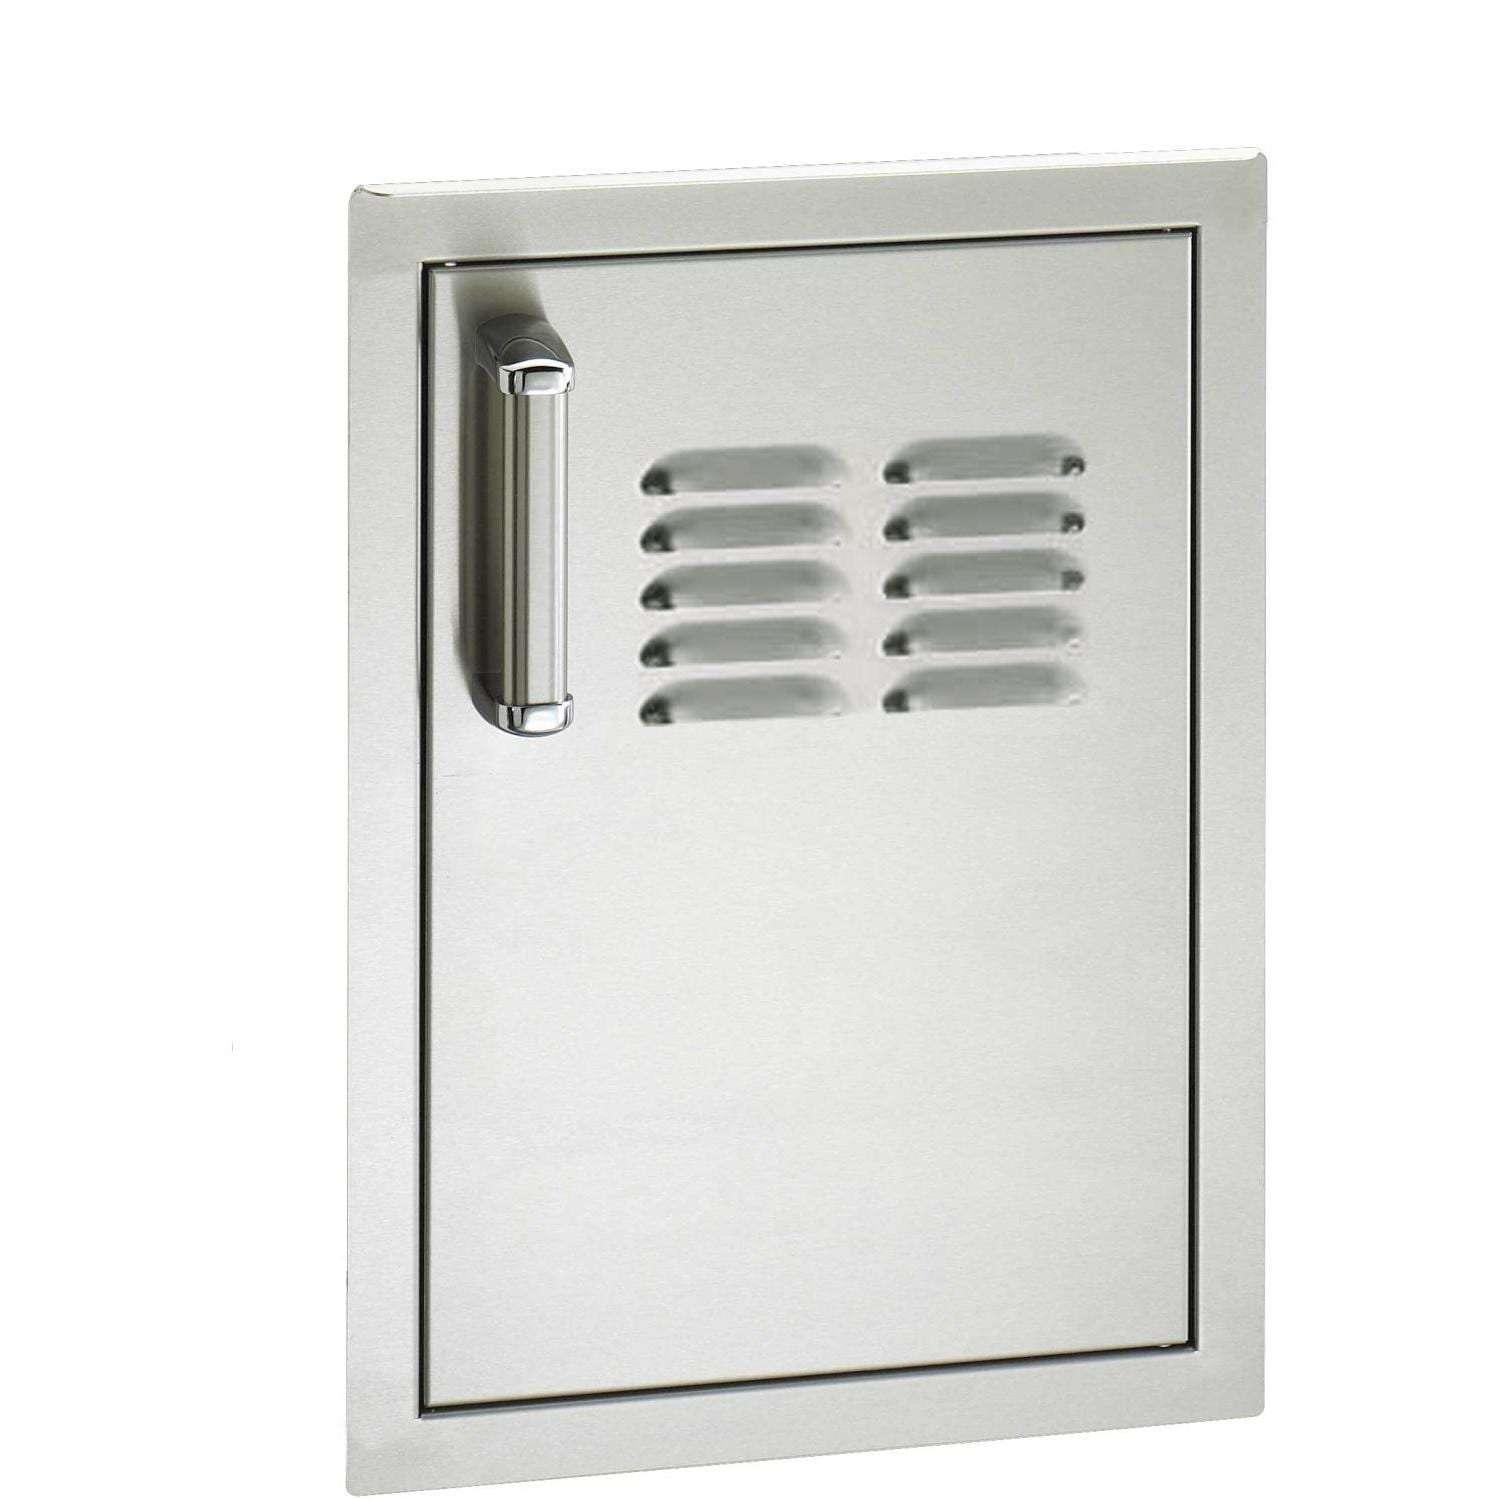 Fire Magic 14 Inch Right Single Access Door